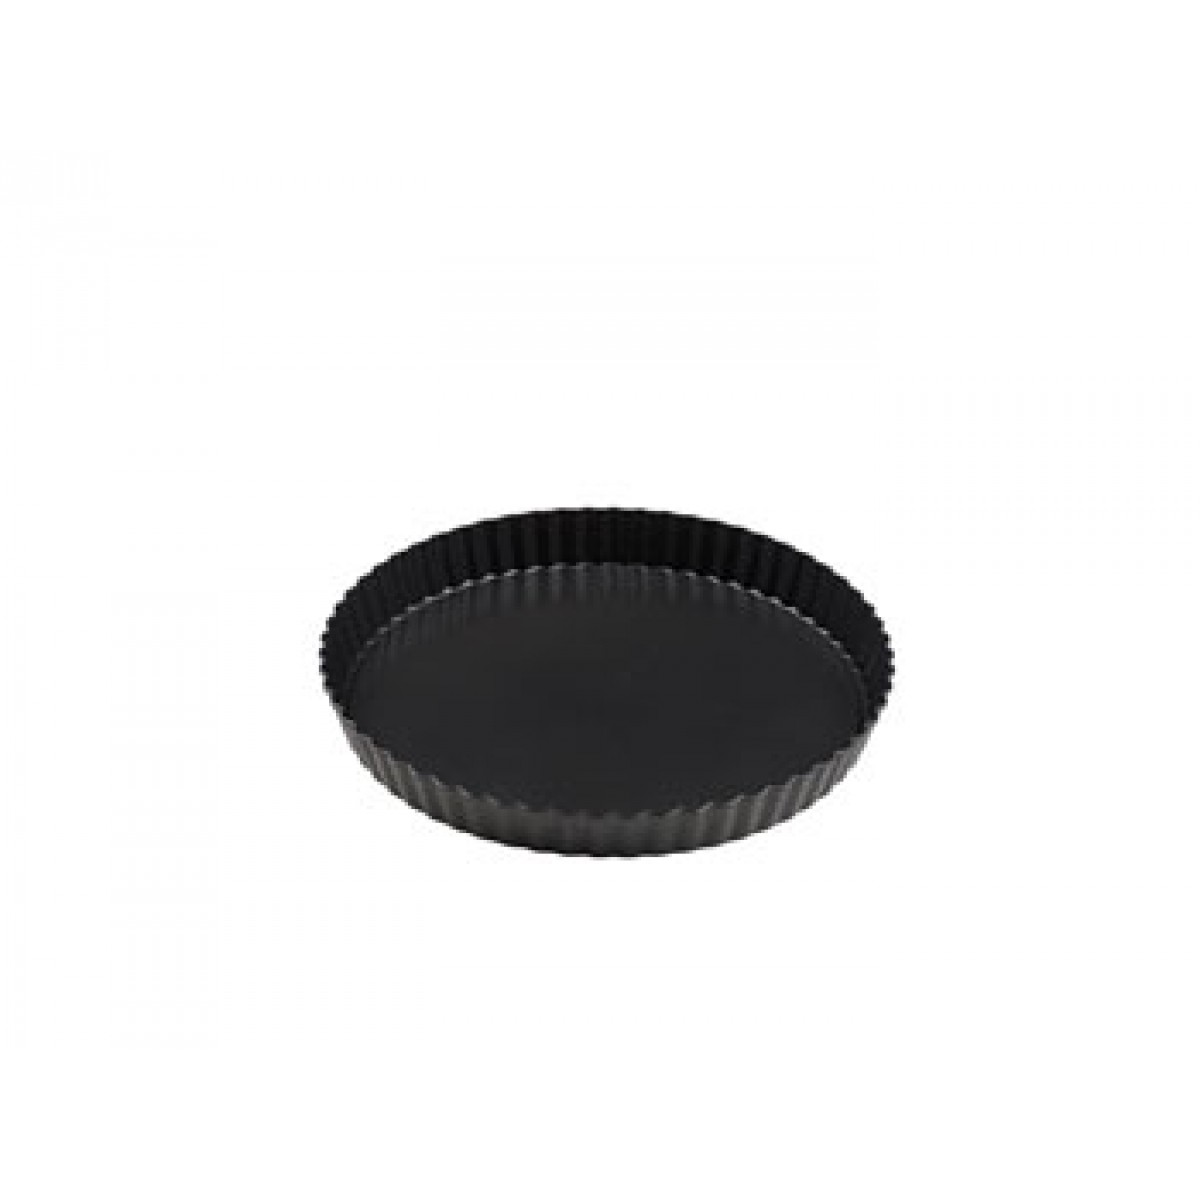 FUNKTION Tærteform m/løs bund ø. 24 cm